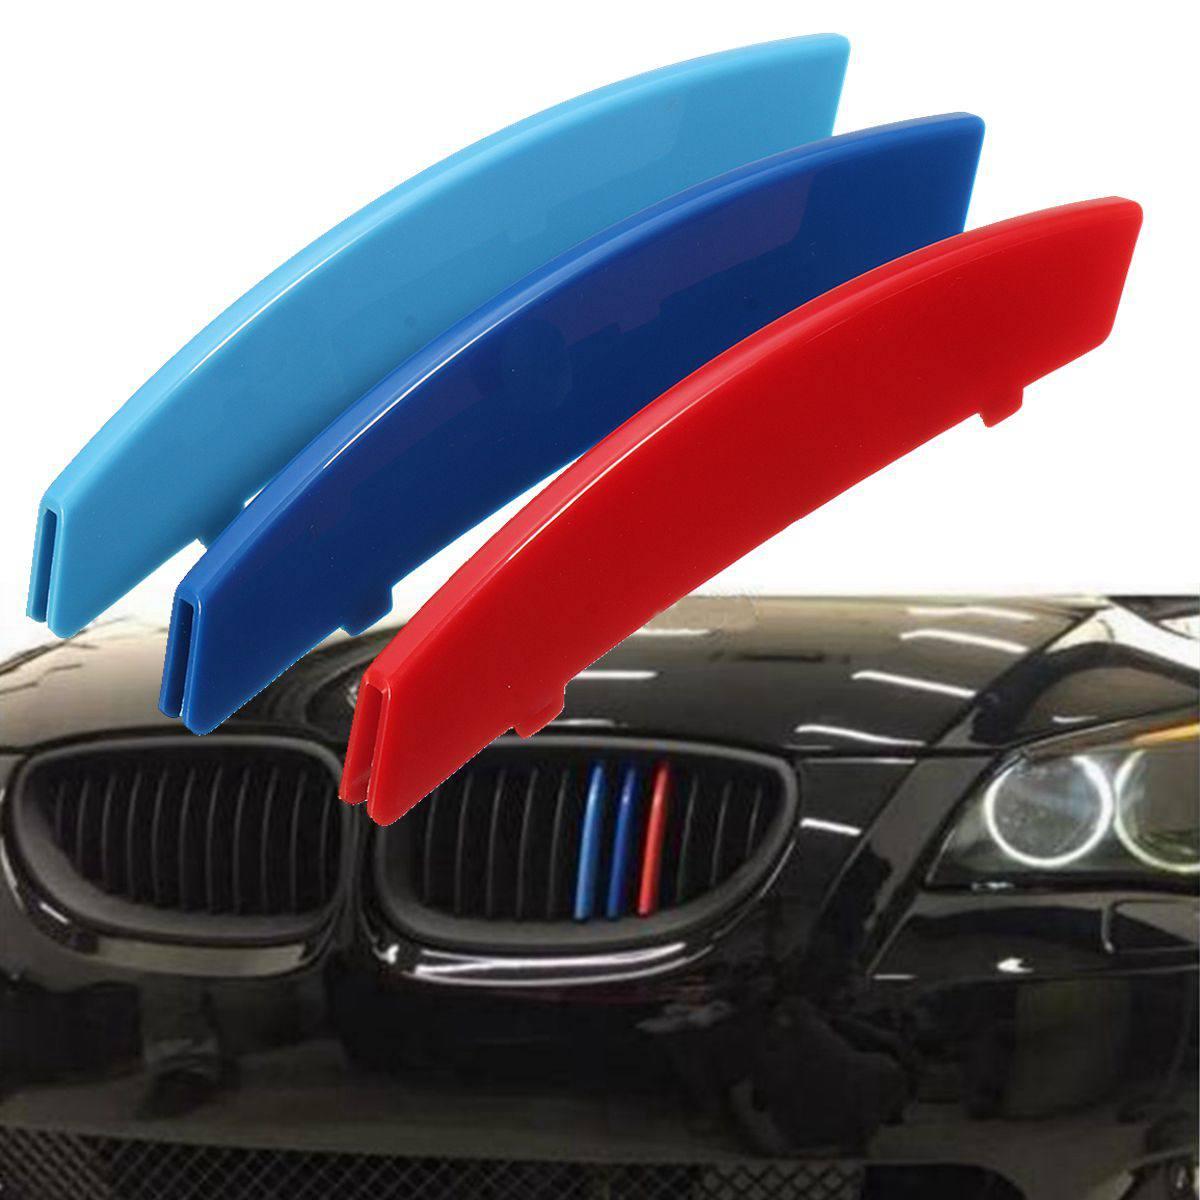 3 uds 3D rejilla de competición para coche deporte de Clip adhesivo ABS pegatina para BMW Serie 3 F30 F31 F35 E90 serie 5 F10 F18 E60 X5 X6 E70